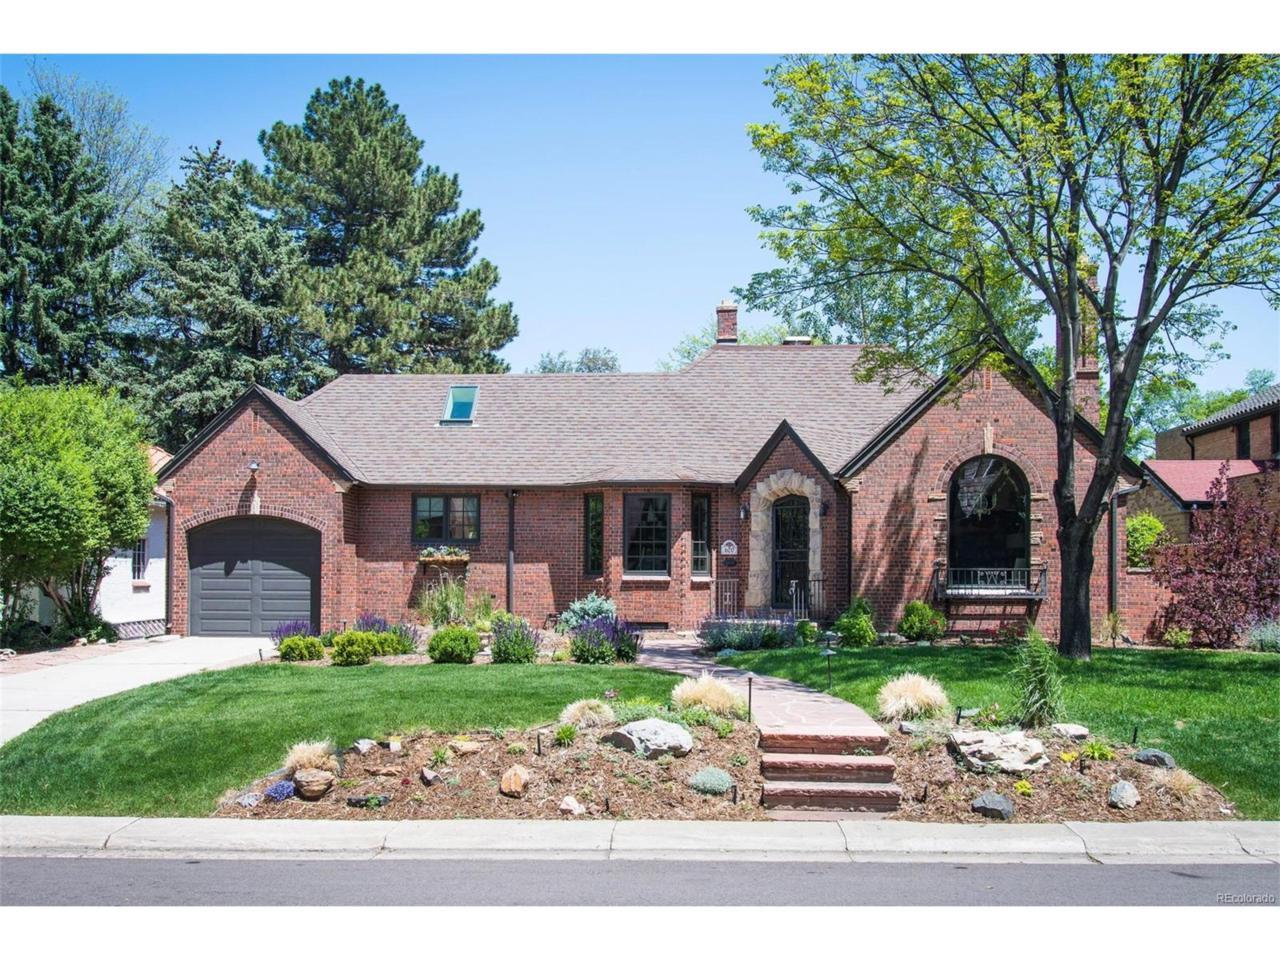 620 Jersey Street, Denver, CO 80220 (MLS #4173556) :: 8z Real Estate